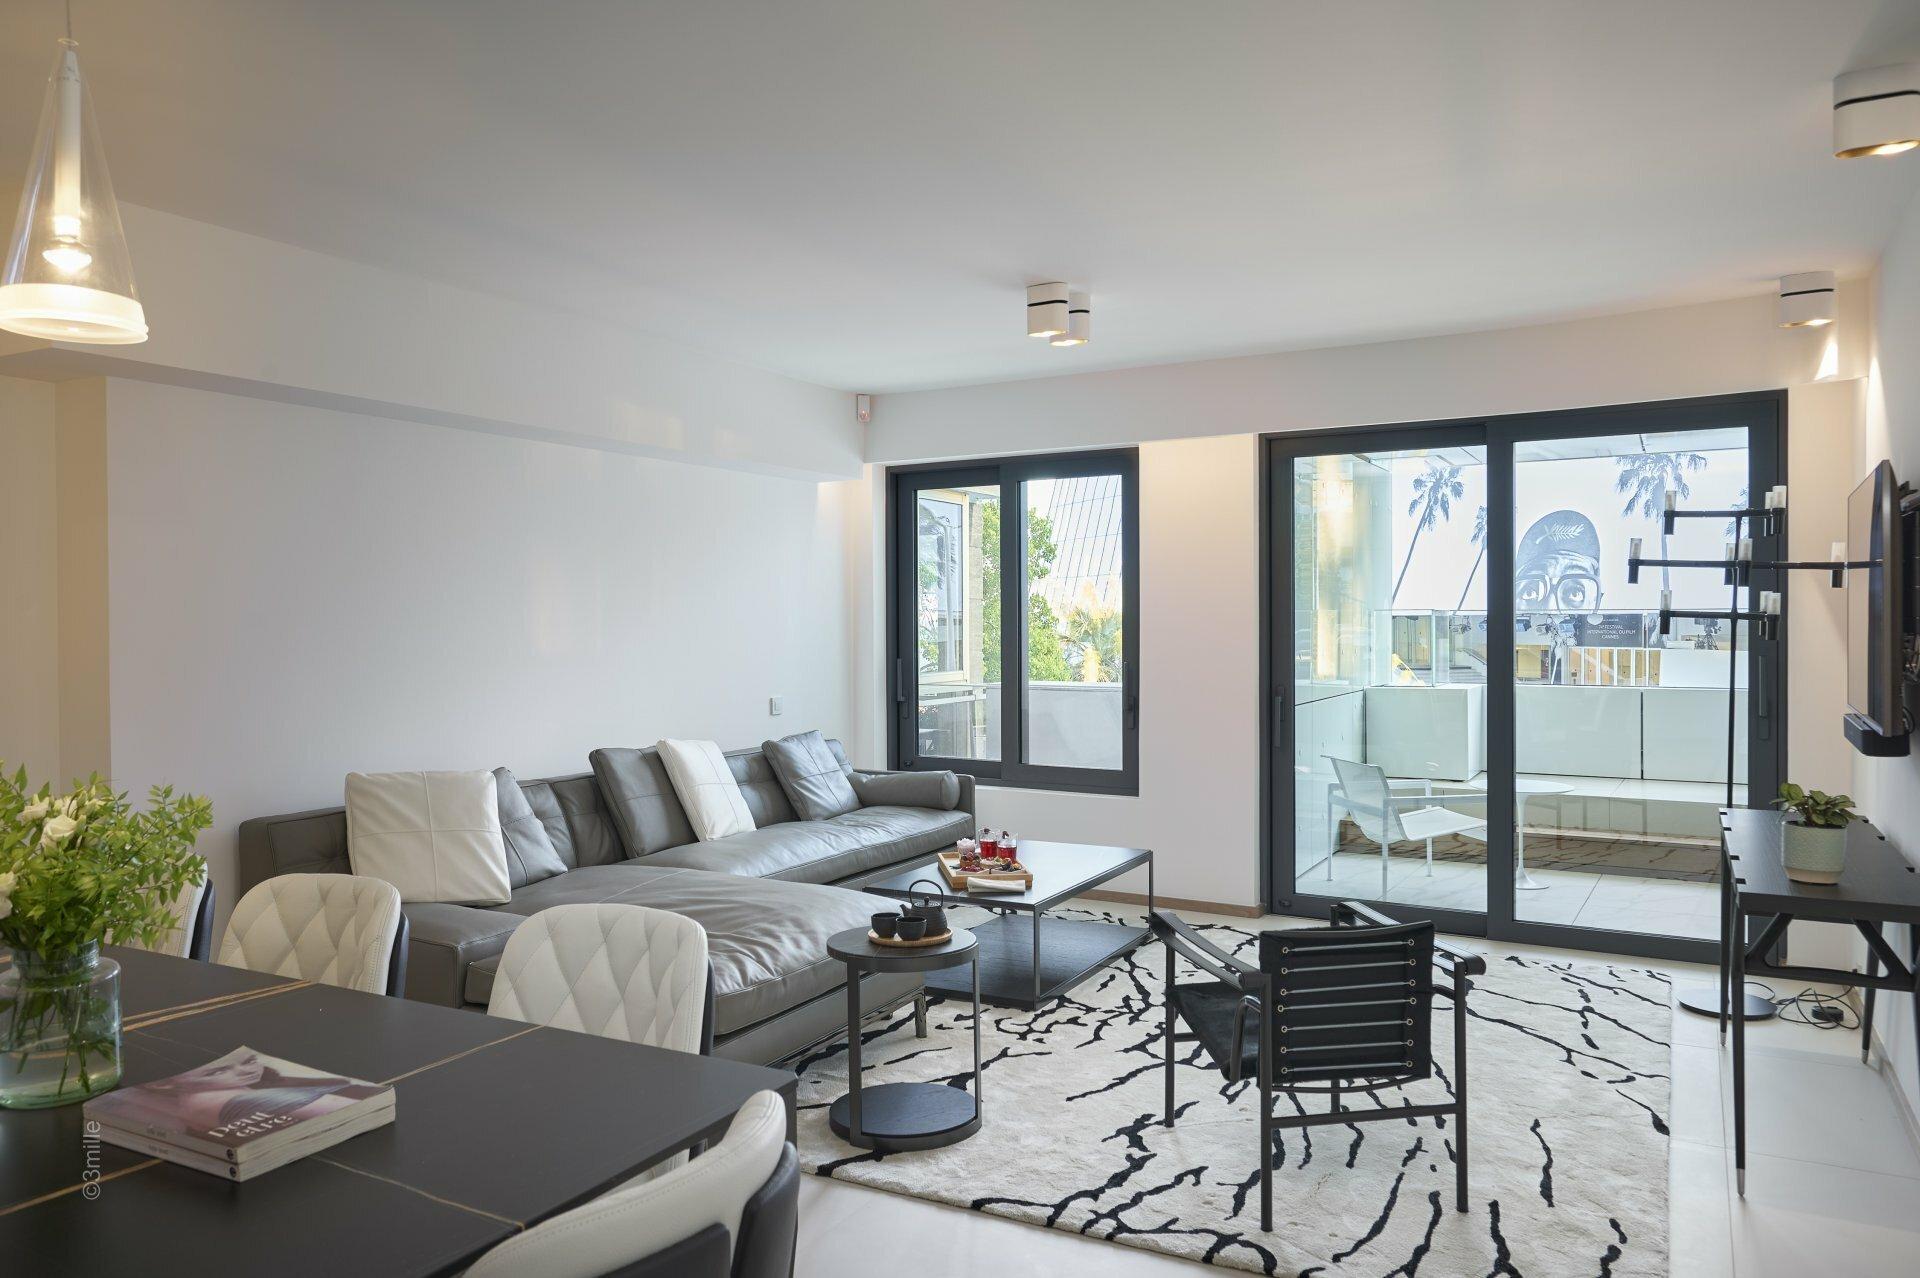 Apartment in Cannes, Provence-Alpes-Côte d'Azur, France 1 - 11660293